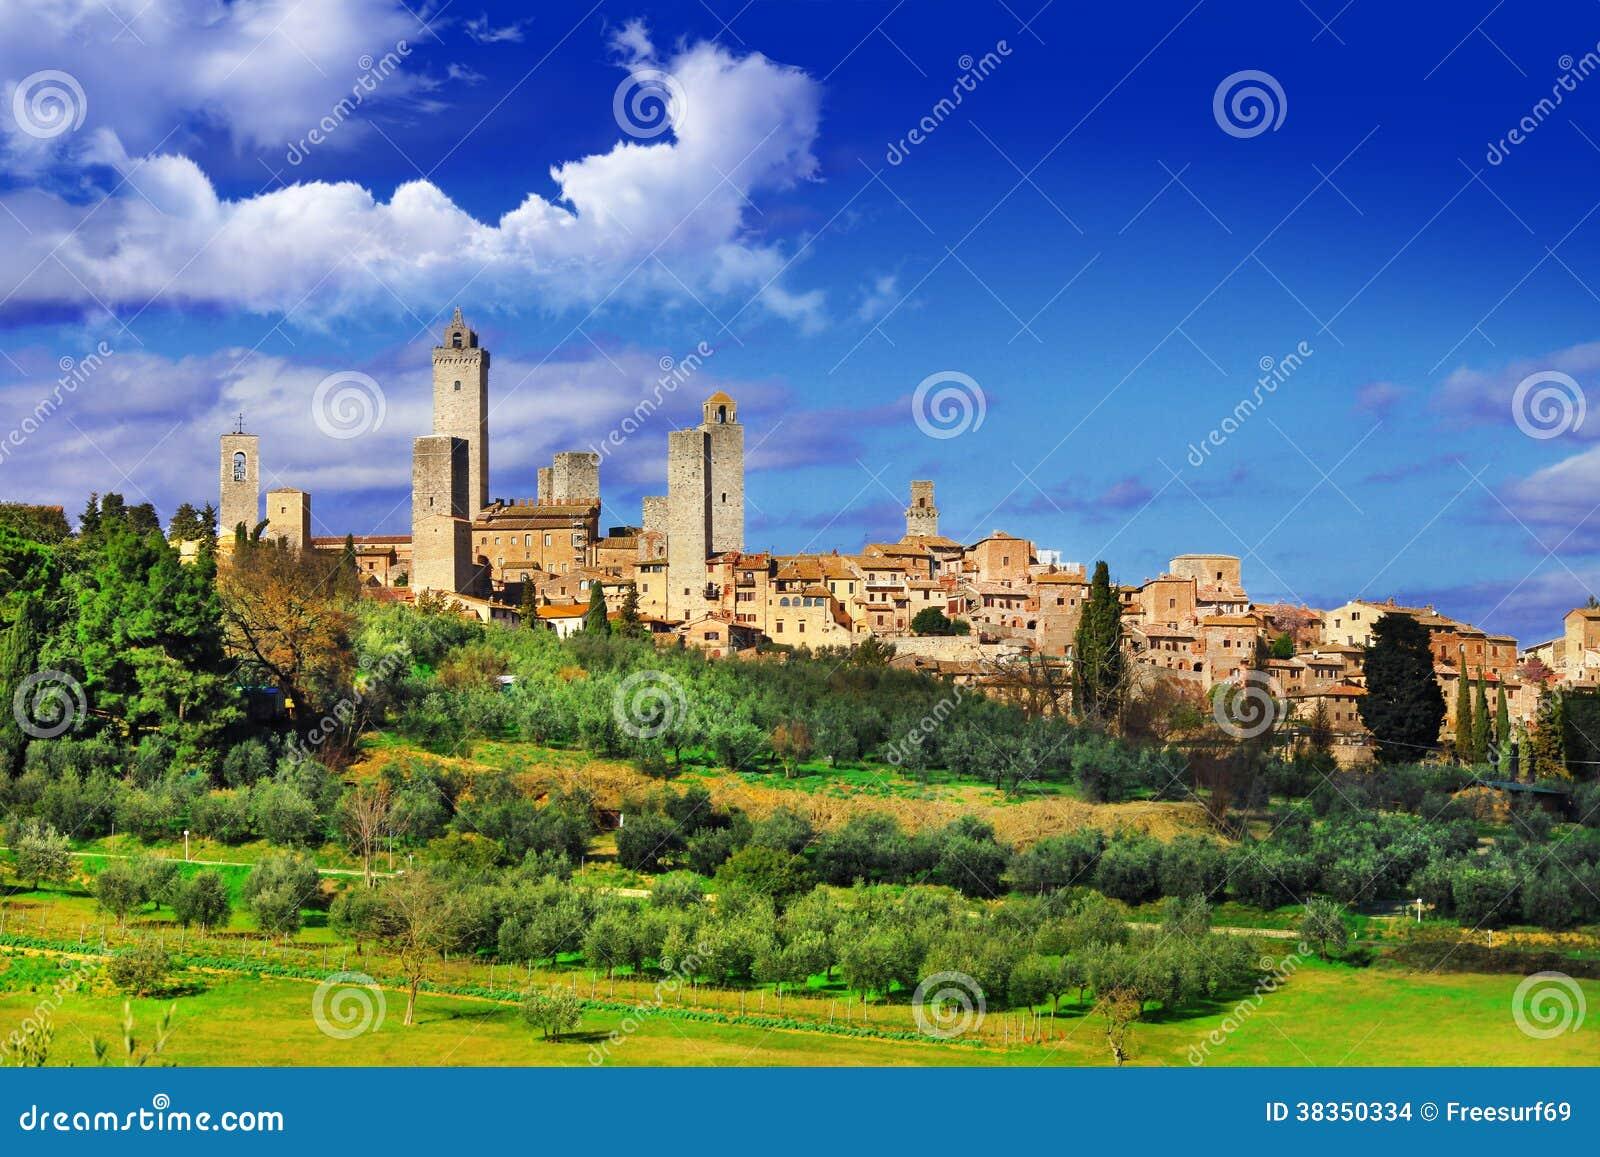 Download San Gimignano stock photo. Image of fortress, siena, italian - 38350334